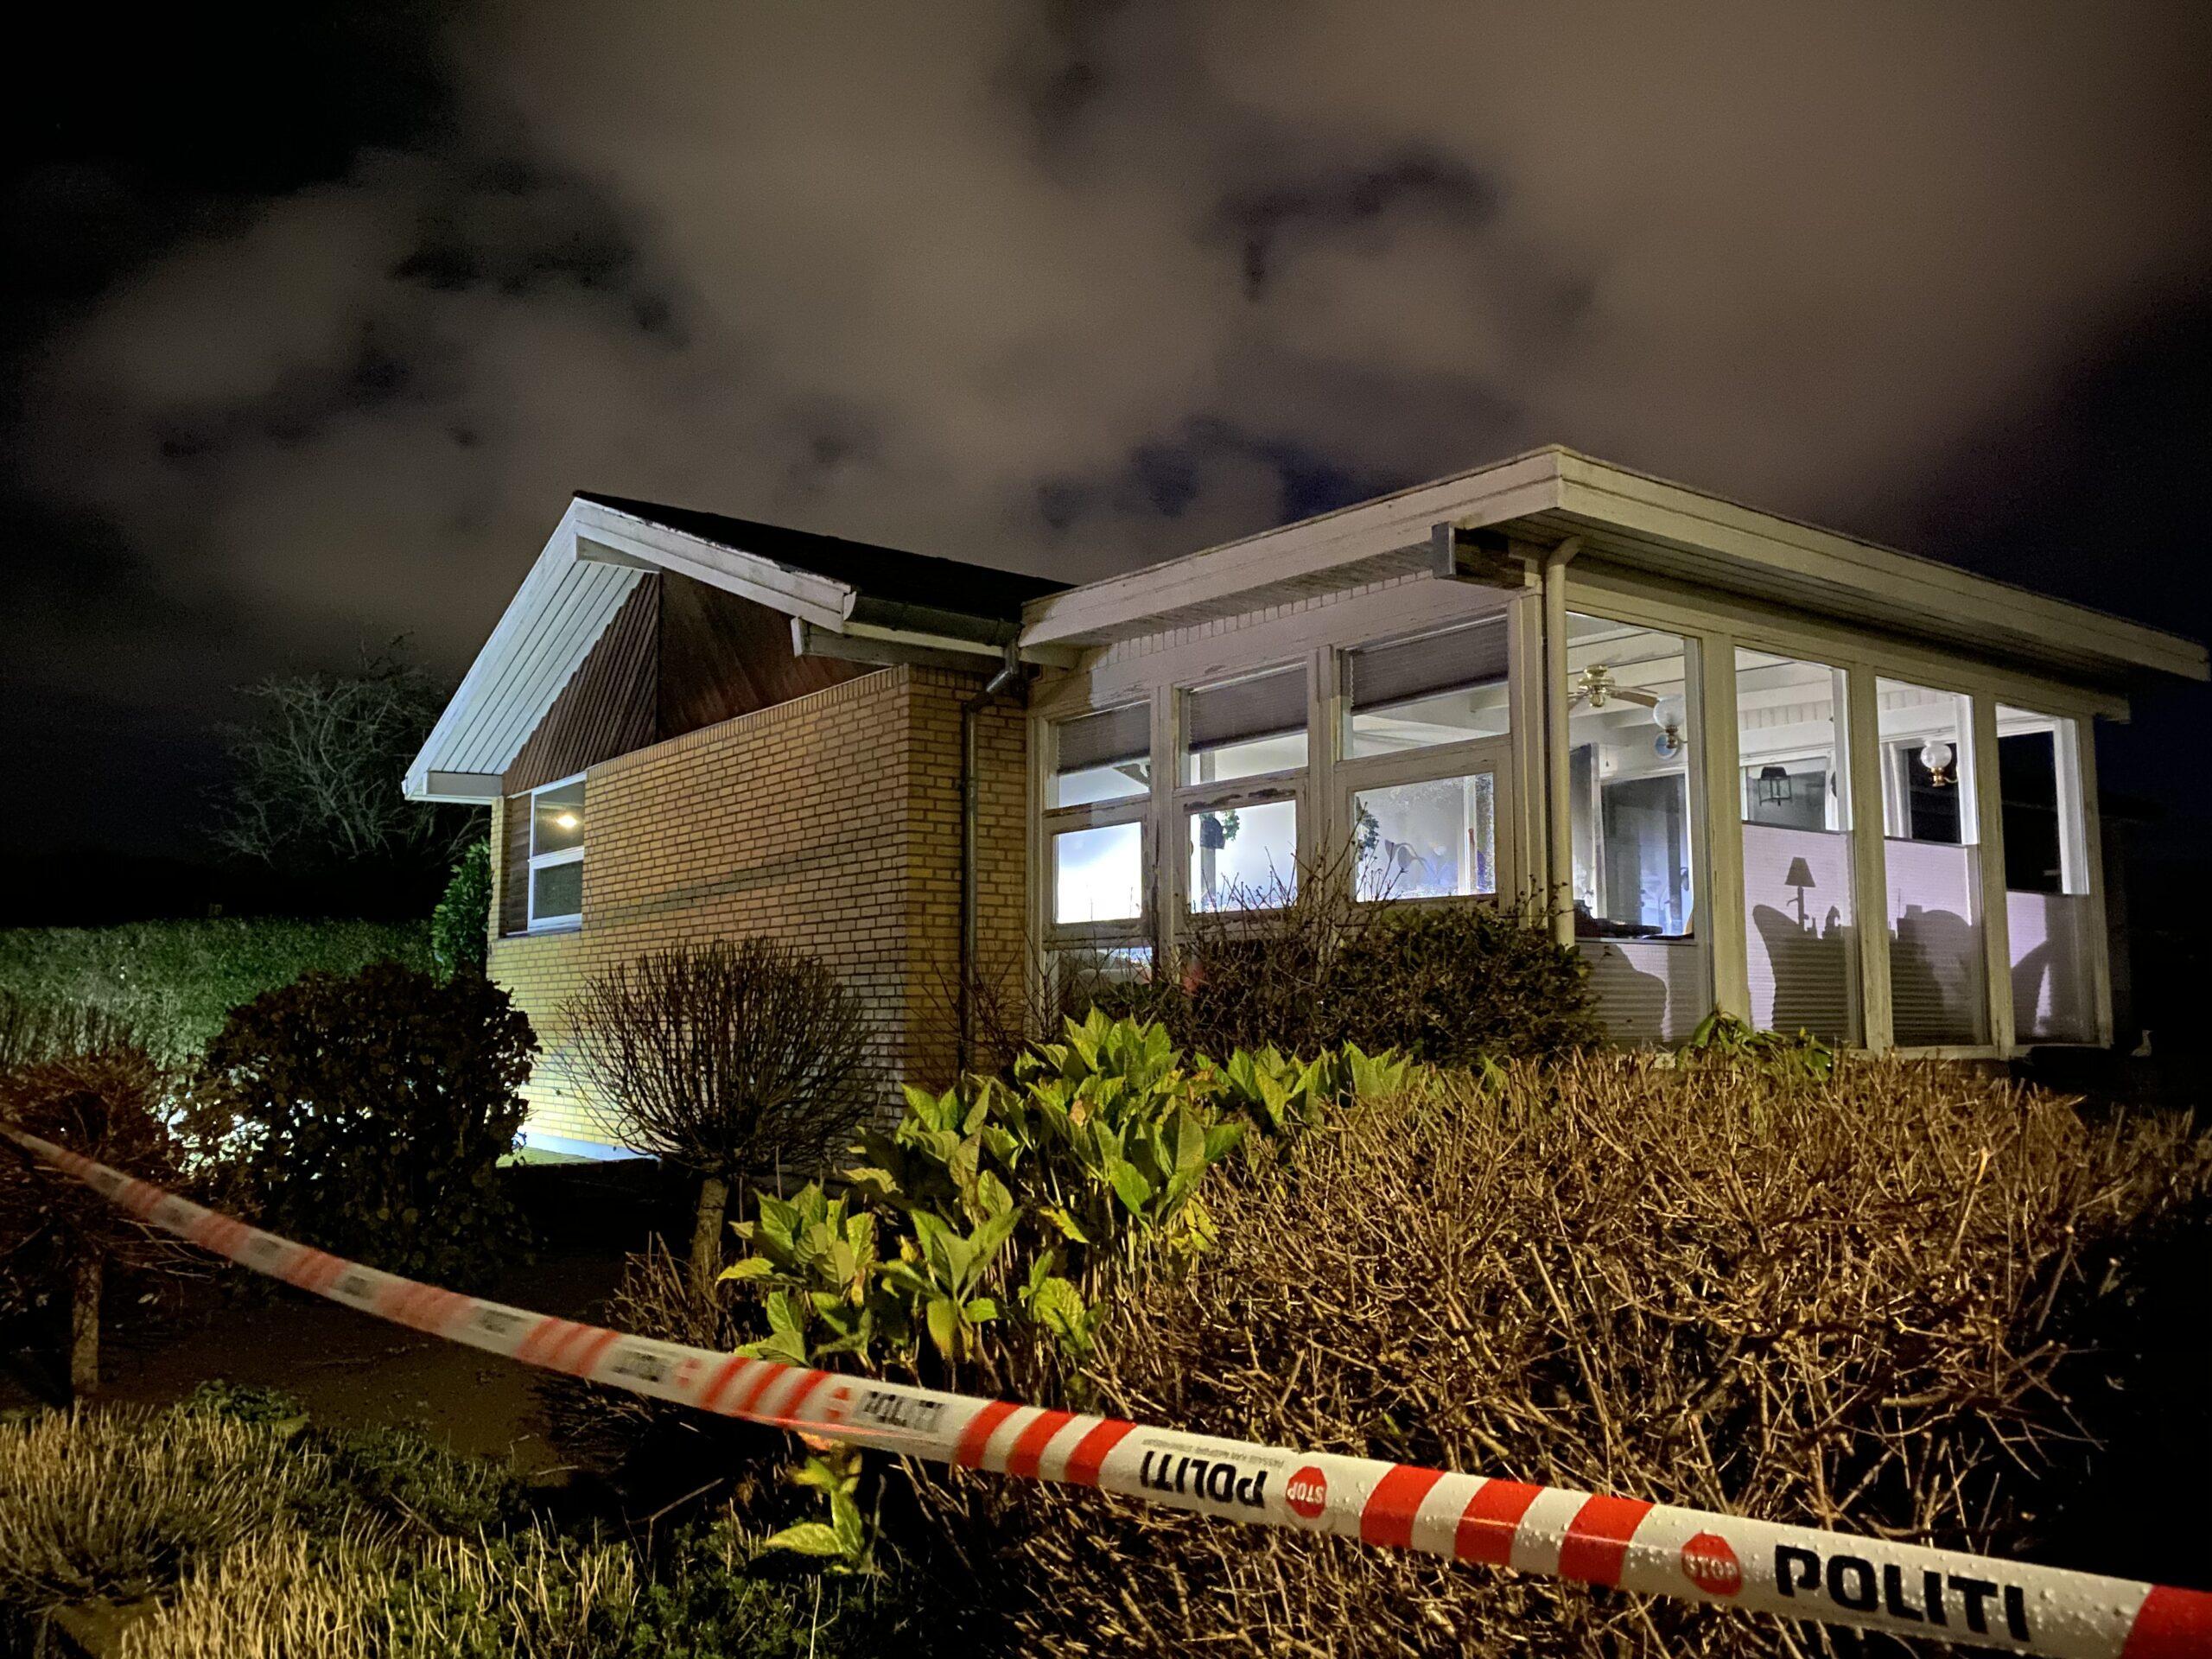 Tragisk dødsbrand: 80-årig død i forbindelse med villabrand i Erritsø